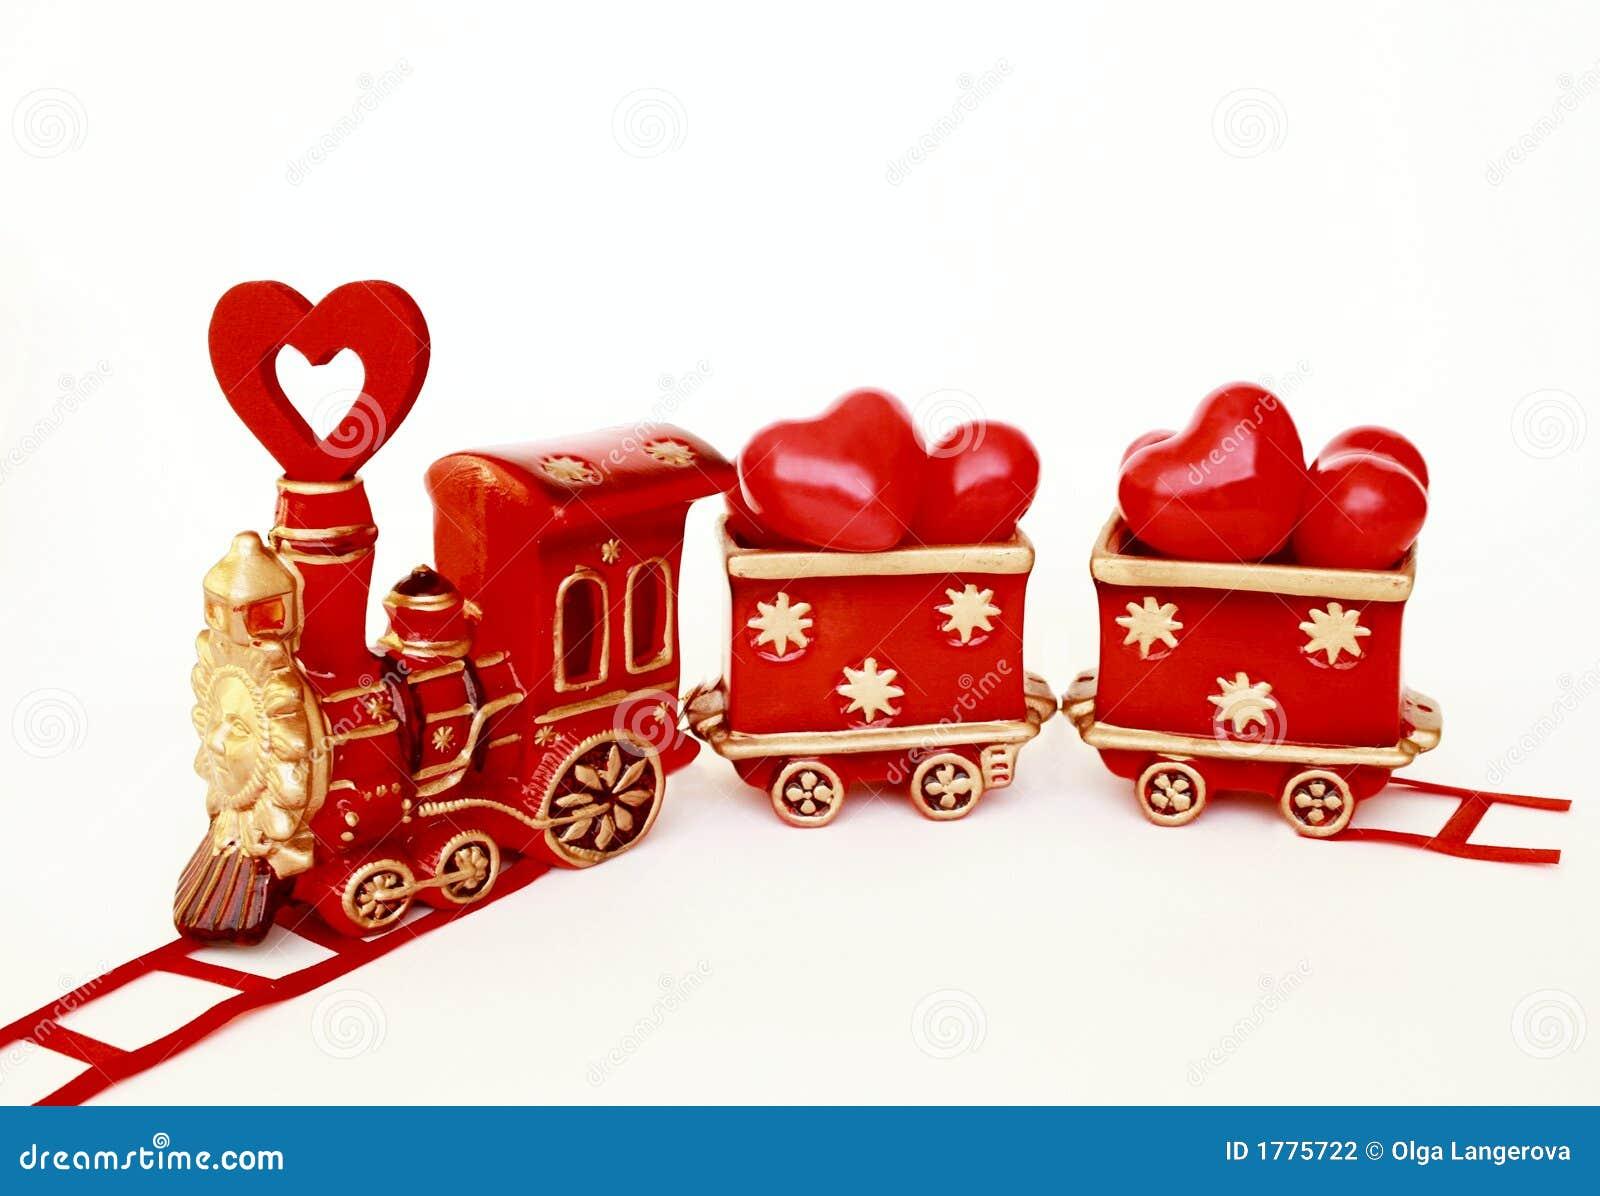 Valentine train stock photo image of model romantic